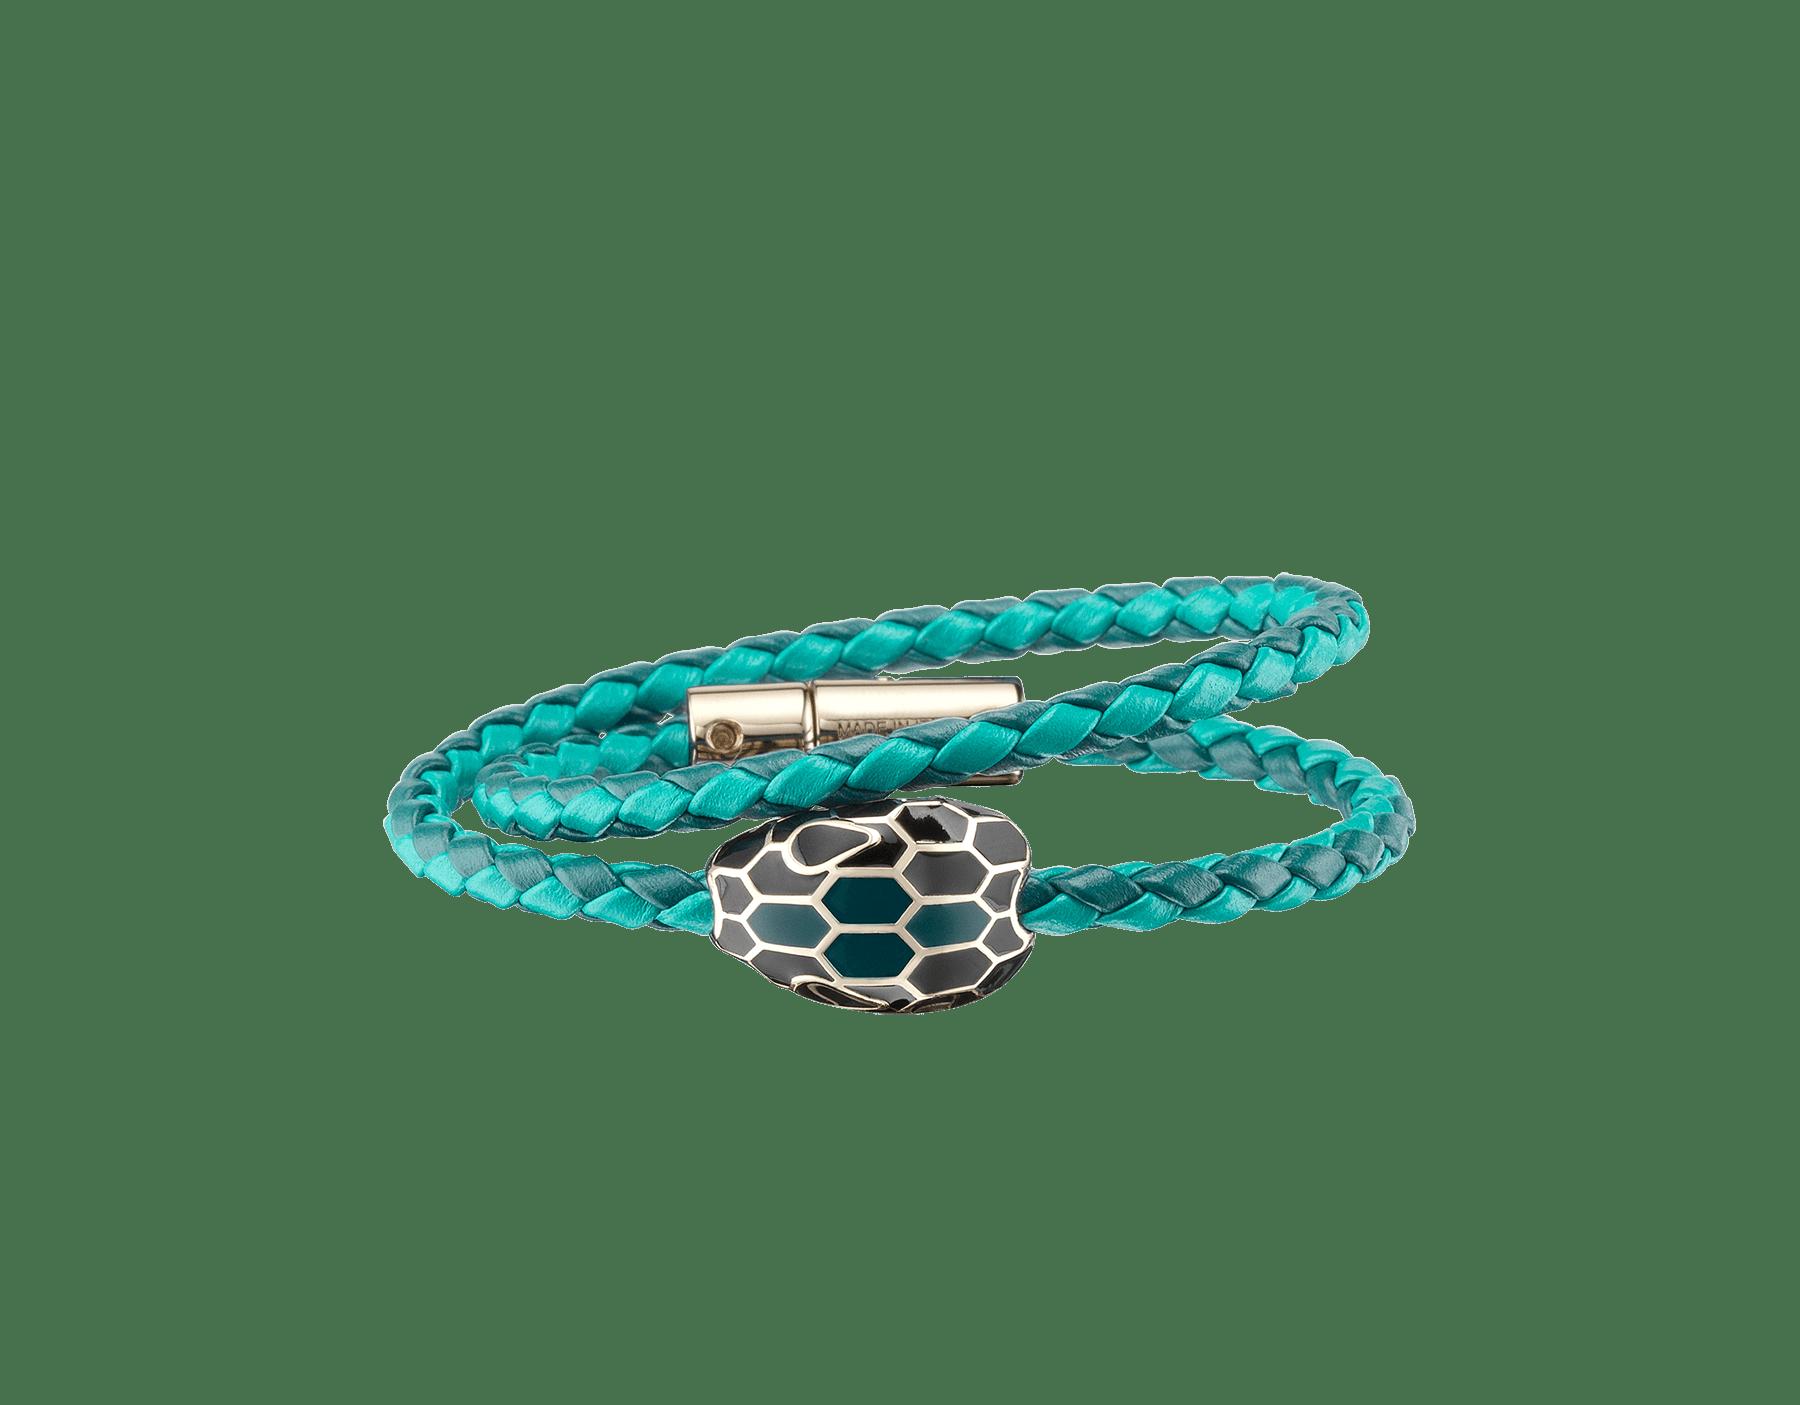 Serpenti Forever 多圈編穗手環採用深綠玉色和熱帶綠松石色編織小牛皮,經典蛇頭元素飾以黑色和深綠玉色琺瑯。 SerpDoubleBraid-WCL-DJTT image 1